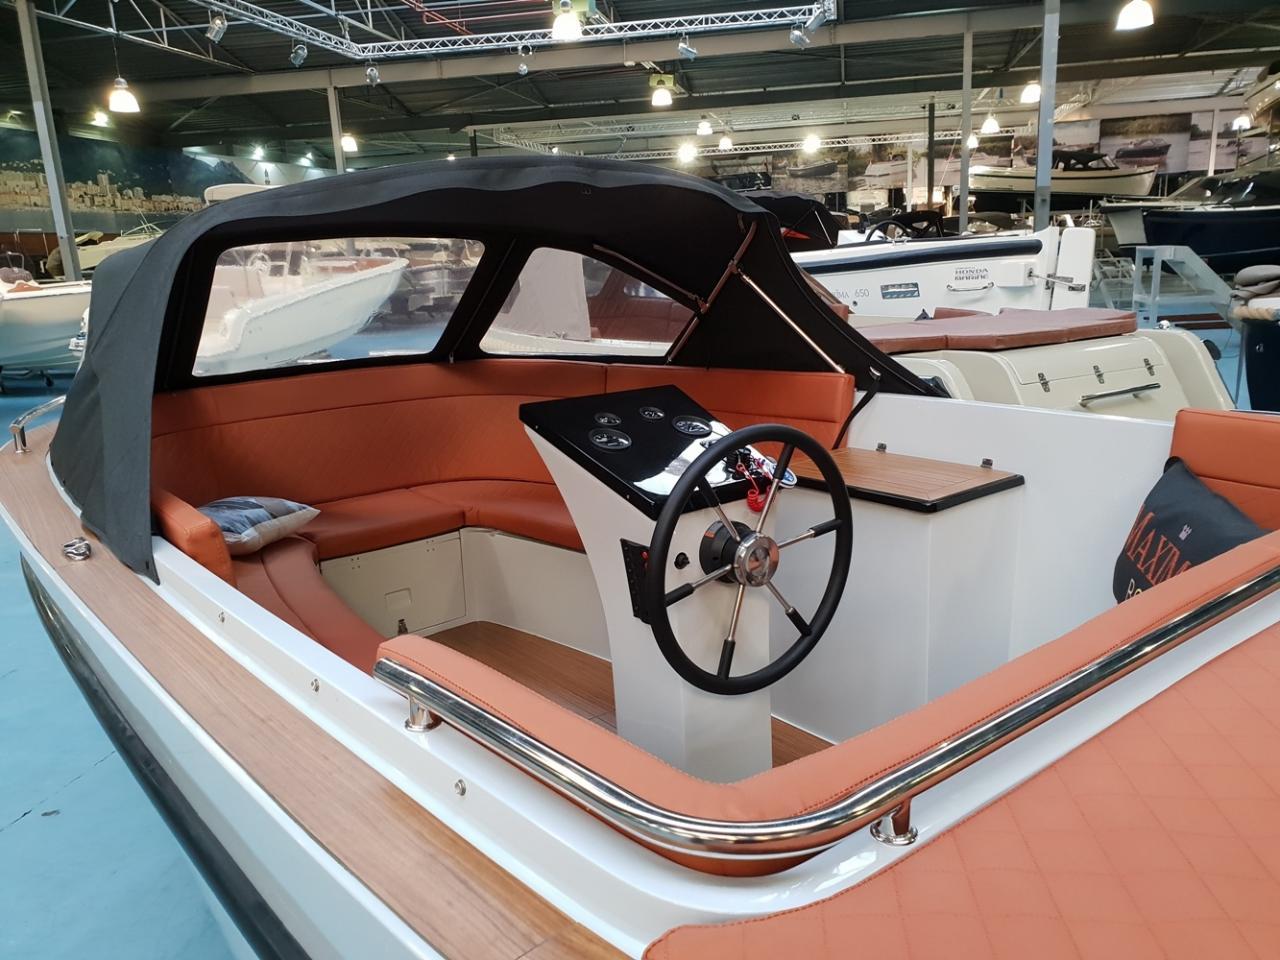 Maxima 630 met Honda 60 pk in lichtgrijze kleurstelling! 4